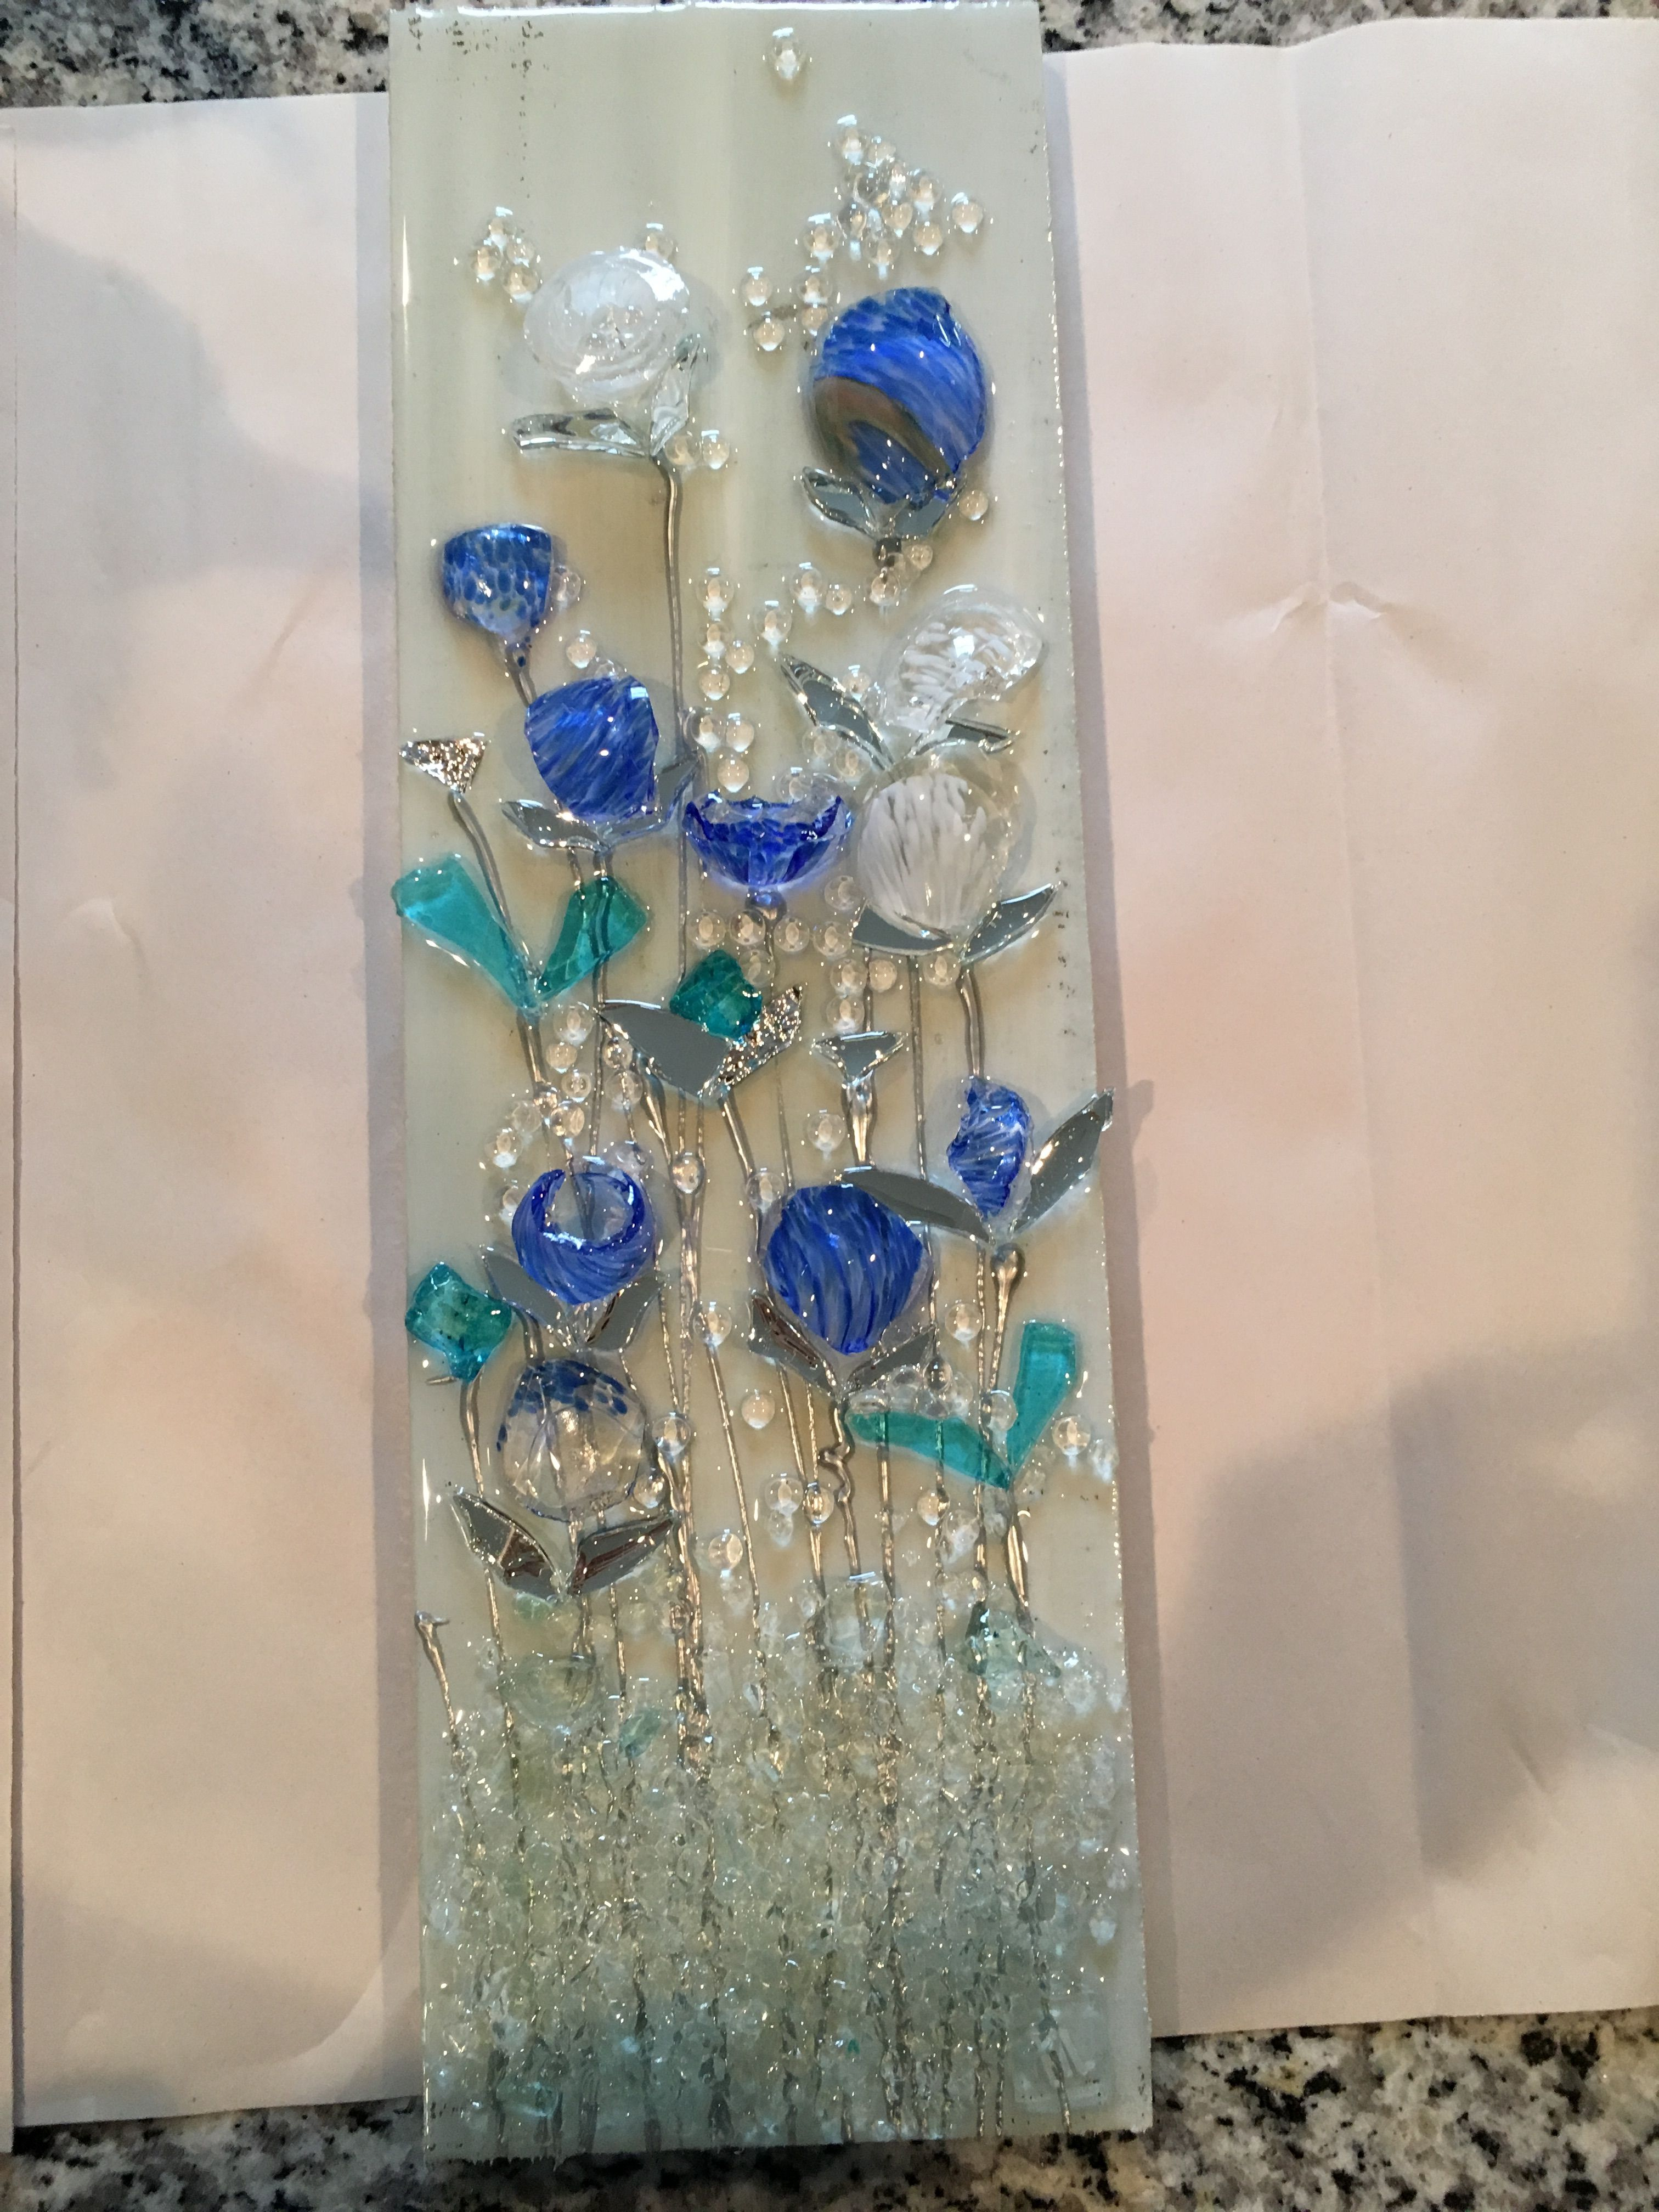 Pin de Laura Anderson en mary hong art | Pinterest | Vidrio, Cuadro ...